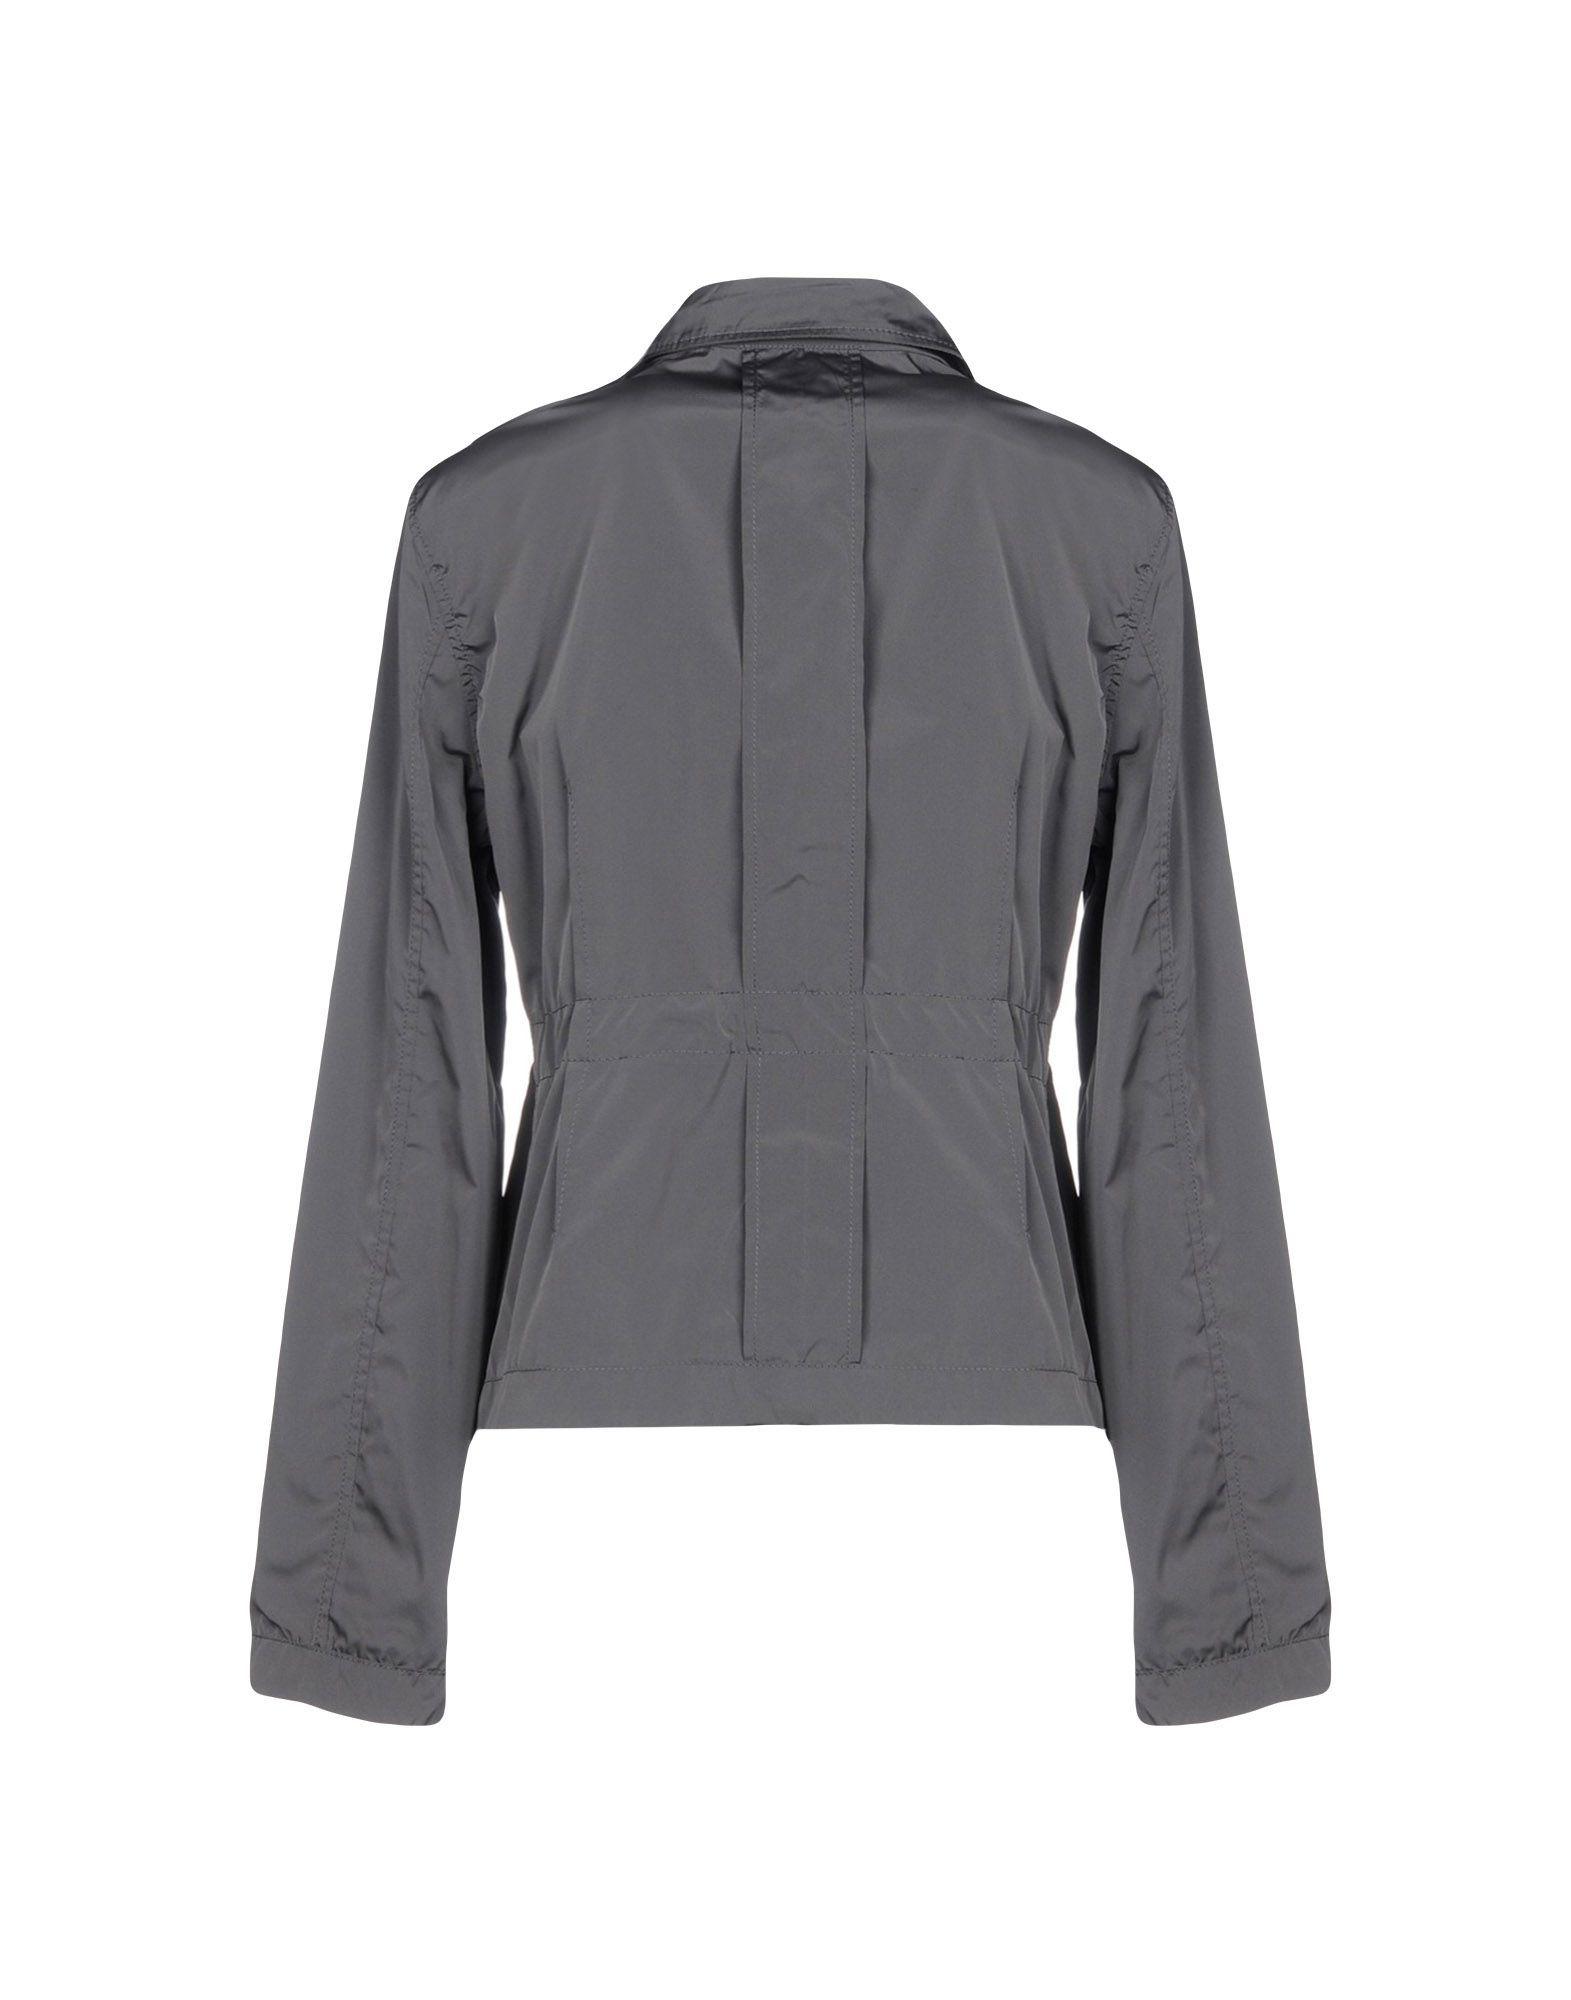 Aspesi Grey Techno Fabric Safari Jacket